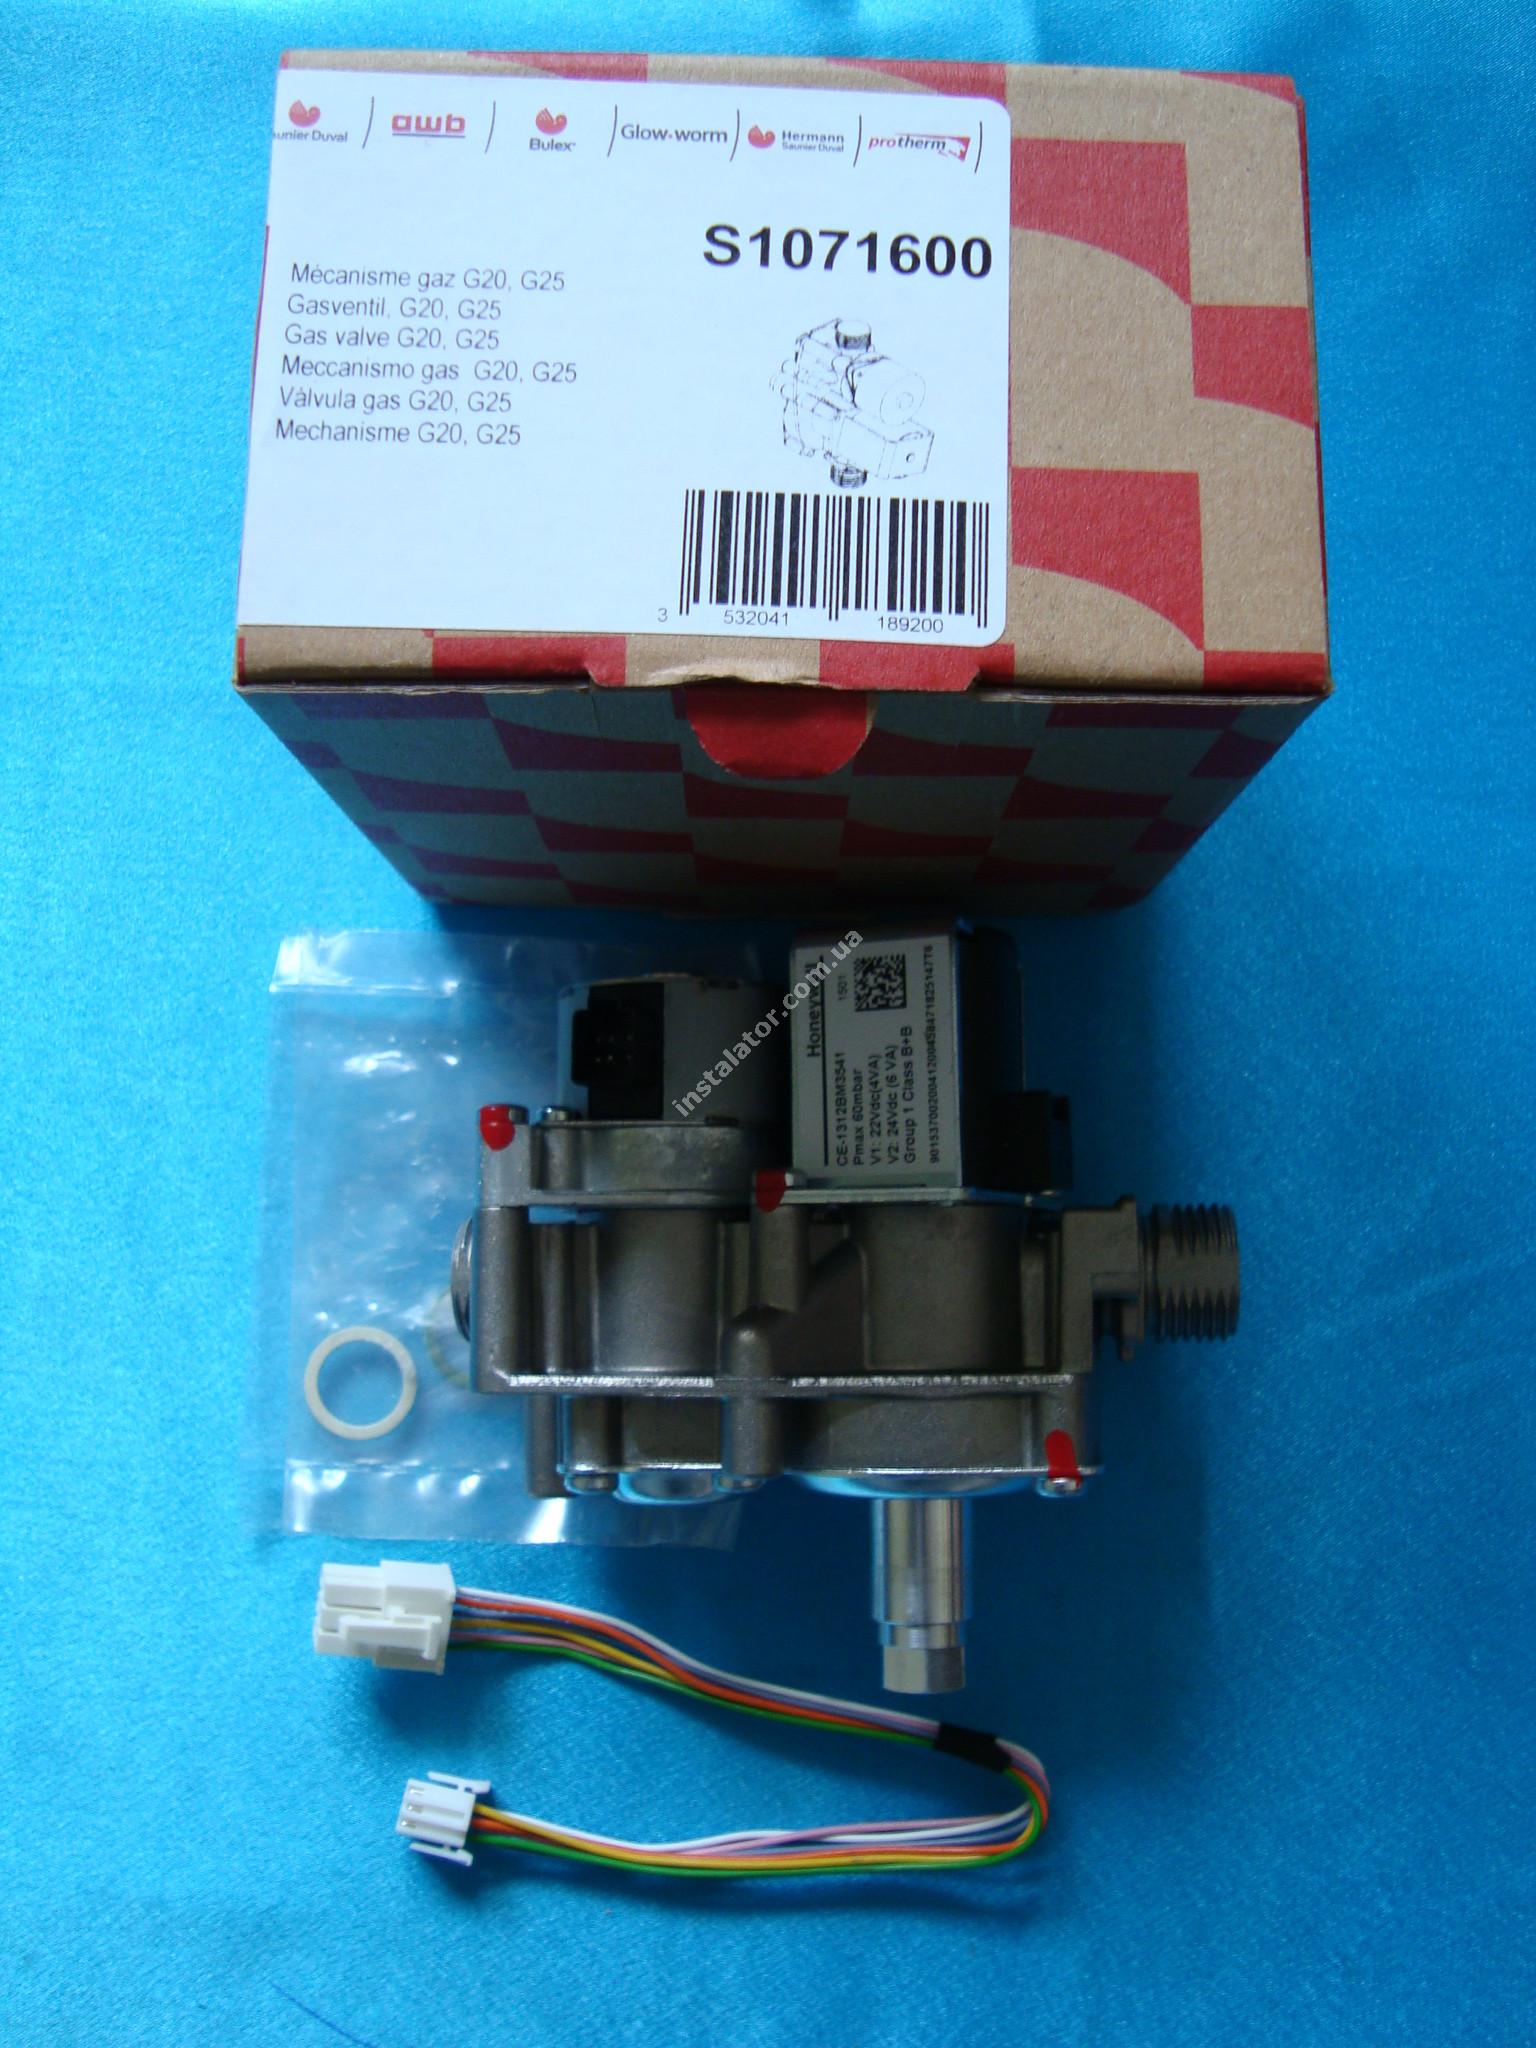 S1071600 Газовий клапан з регулятором SAUNIER DUVAL Themaclassic, Isofast, Combitek  full-image-1